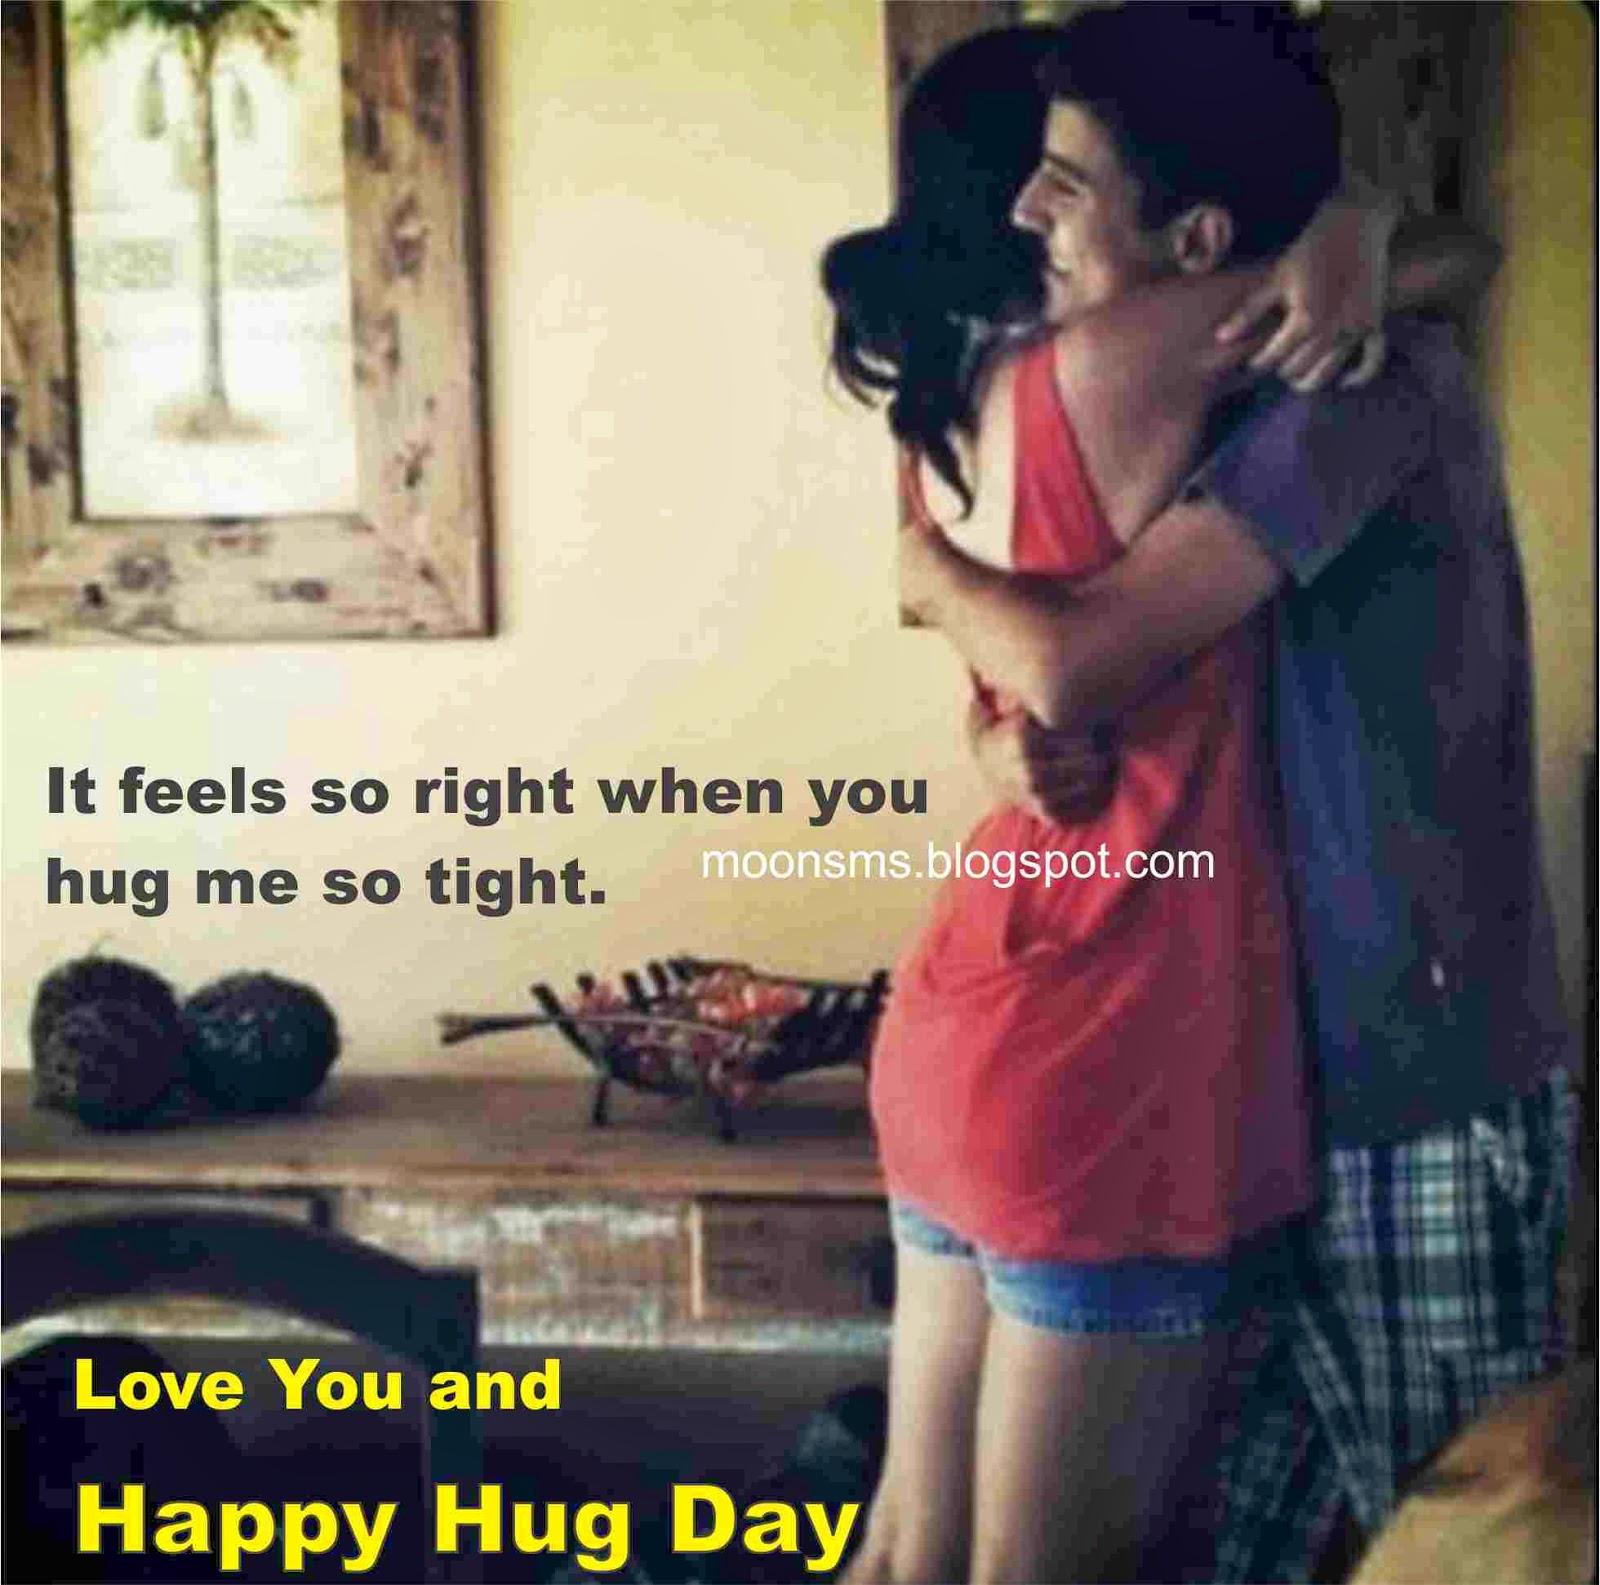 How to hug a girl your dating